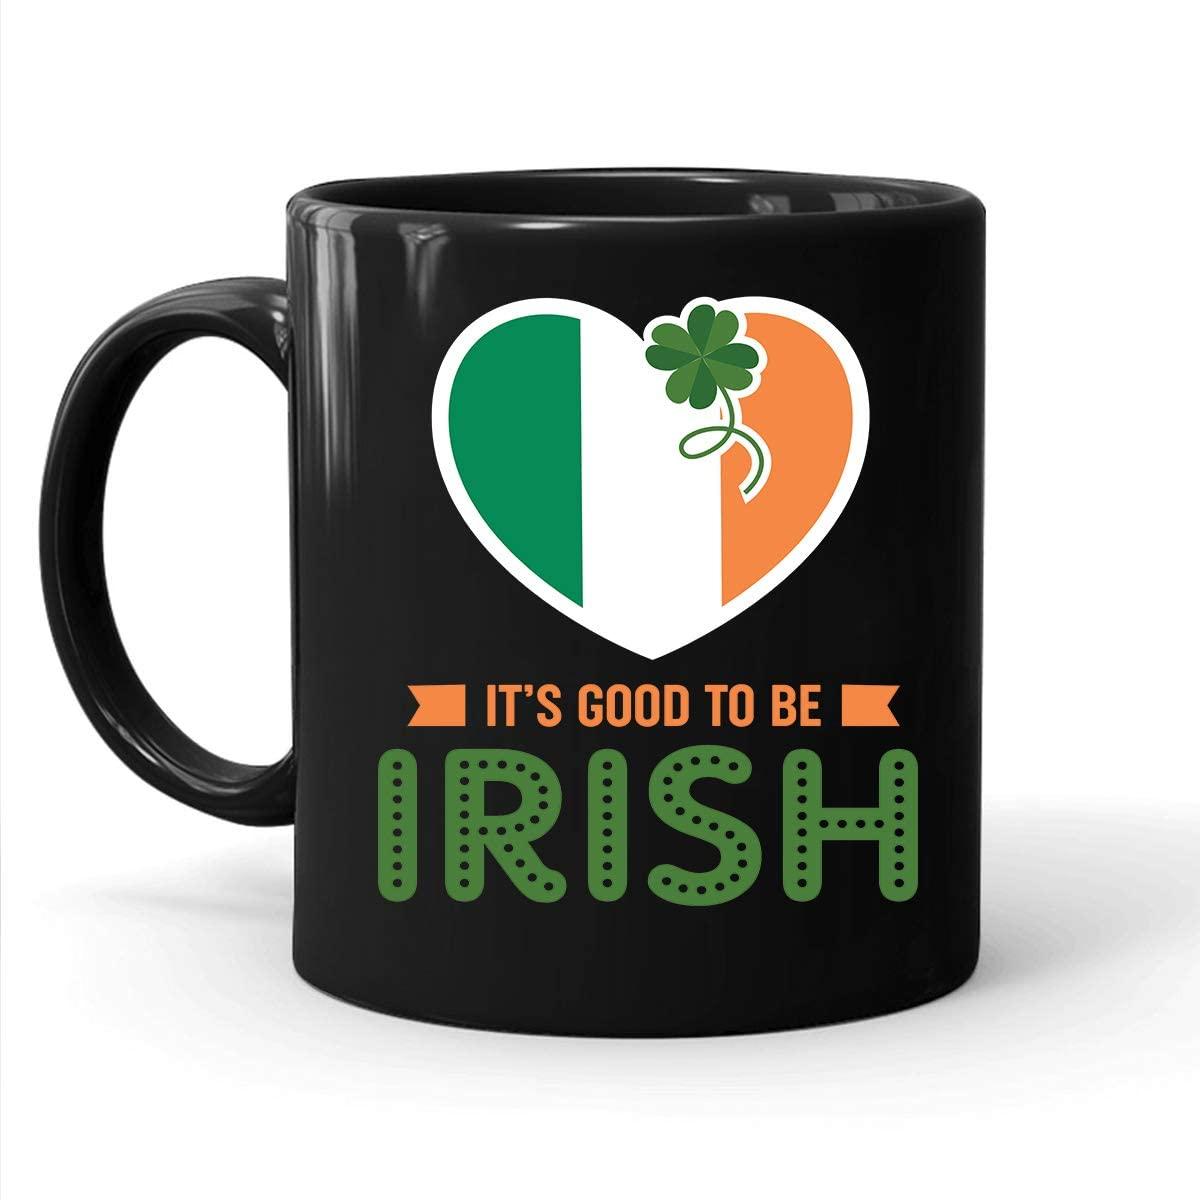 It's Good To be Irish, I Love Irish, Heart Irish Mug, Funny Irish On St. Patrick's Day, Gifts Dad, Mom, Wife, Daughter, Son, Husband On St. Patrick's Day, Birthday Coffee Mug (Black, 11oz)